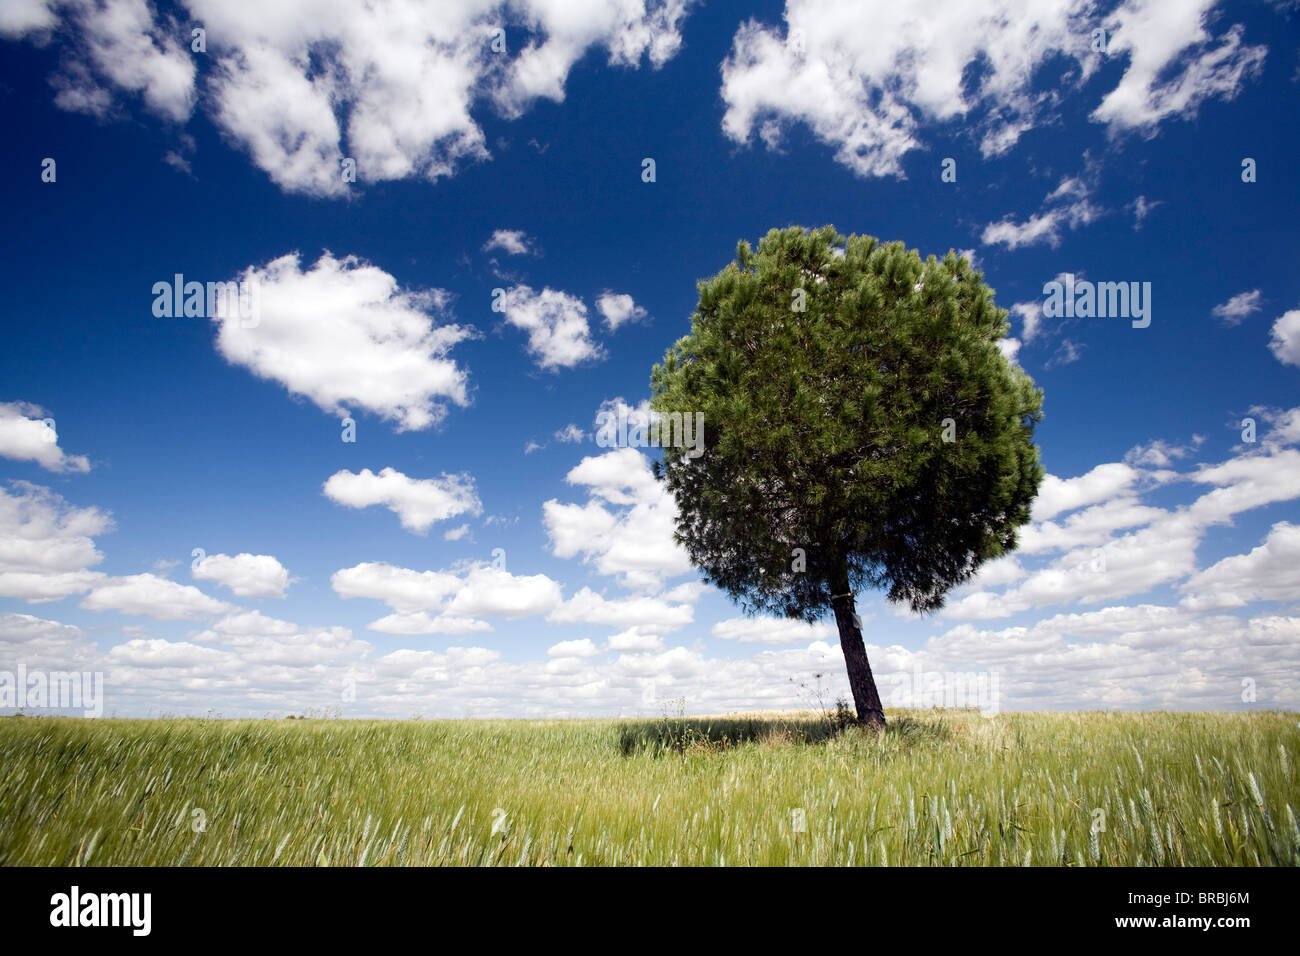 A tree in a wheat field, Sevilla, Spain Stock Photo